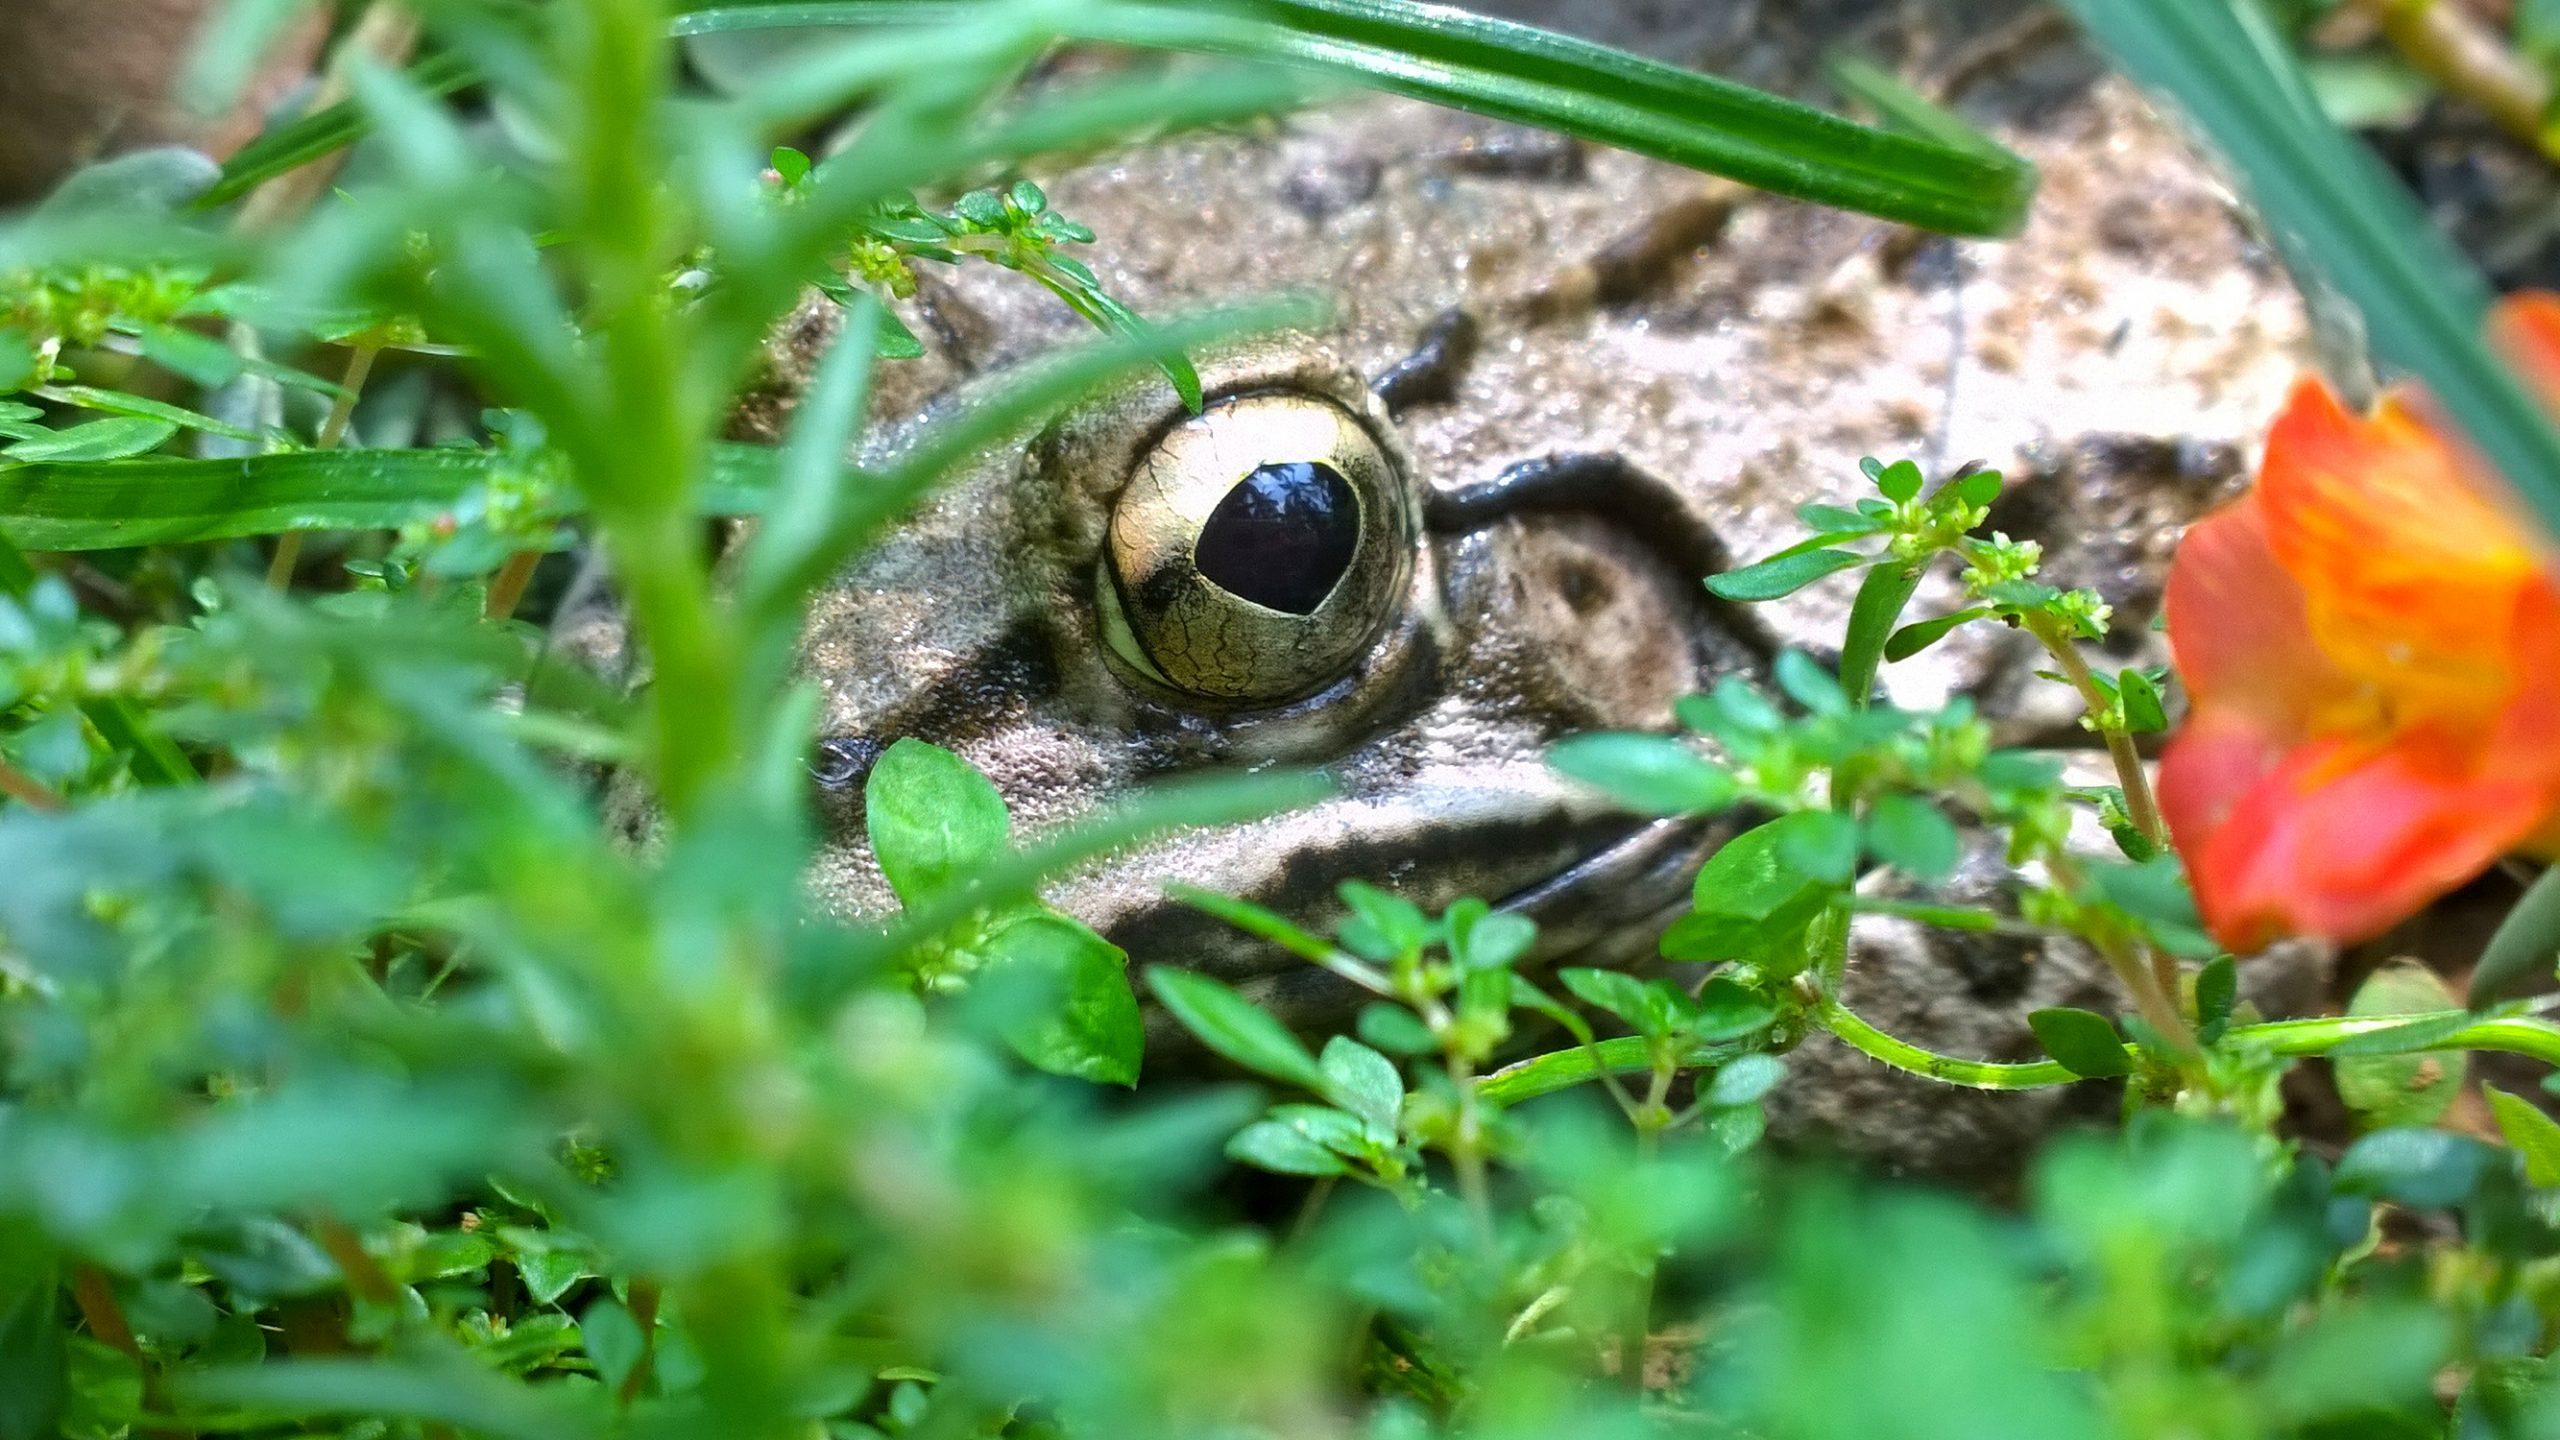 Frog surrounded with lush foliage